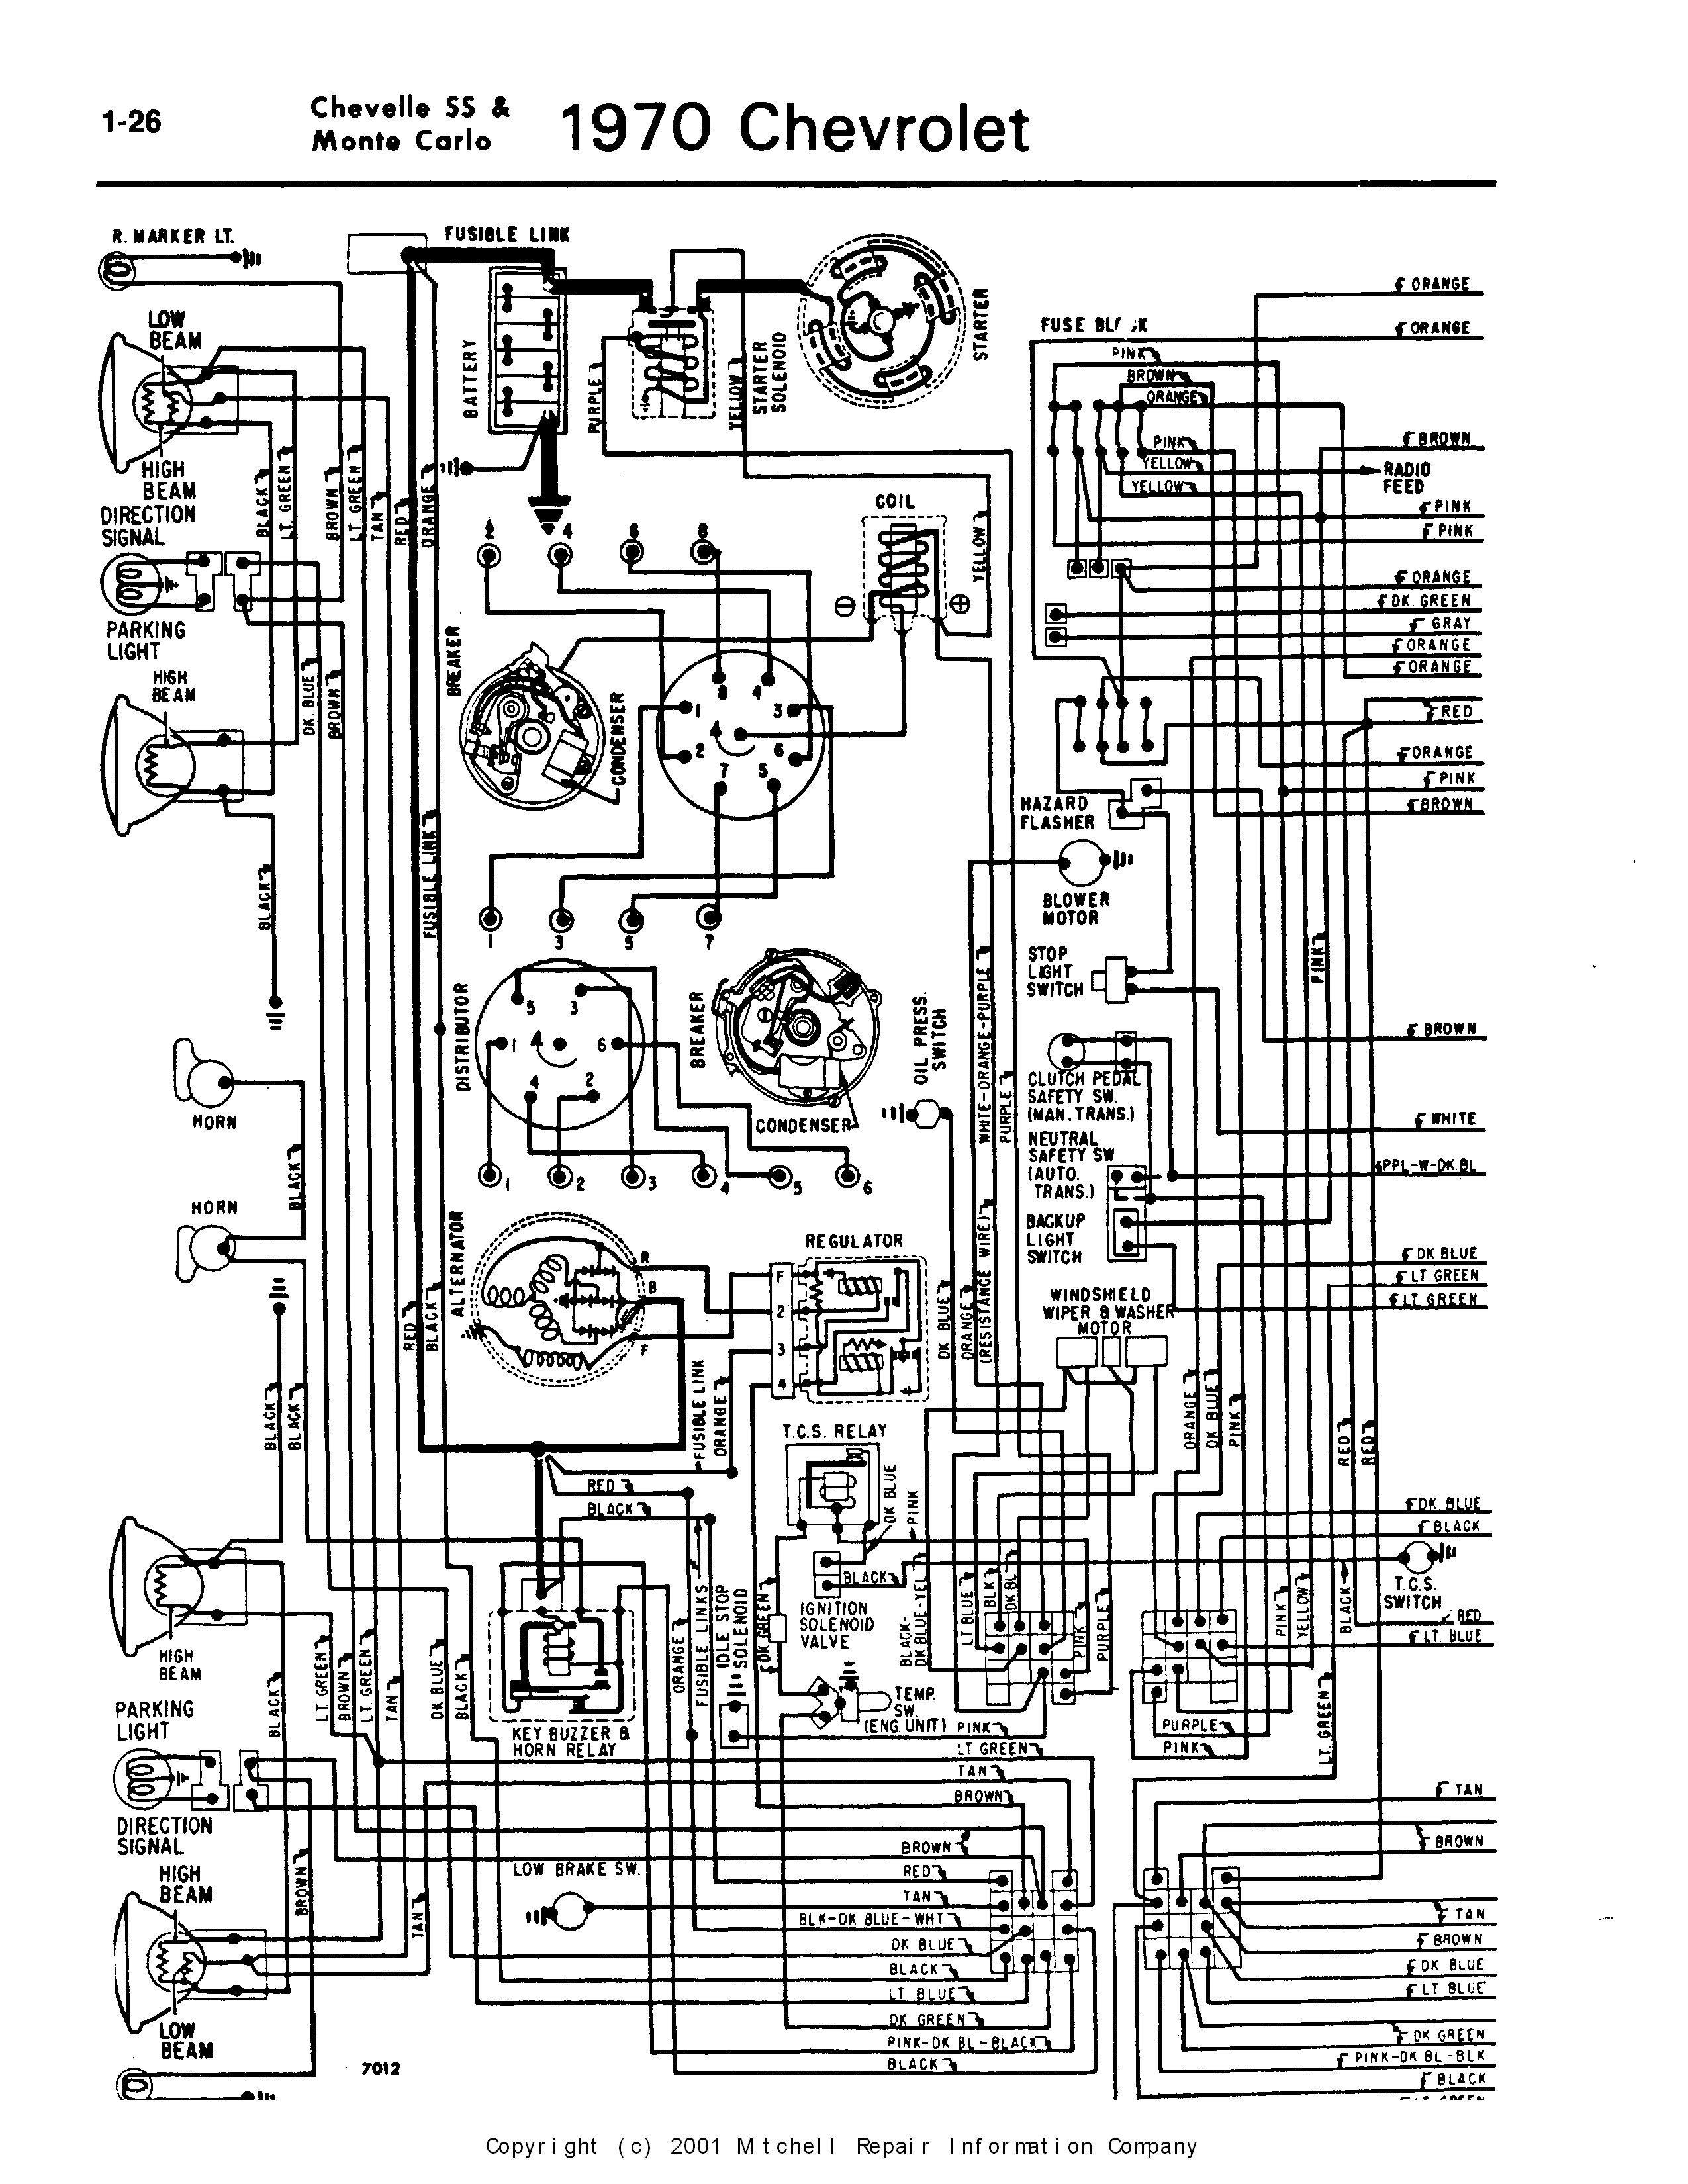 1969 C10 Wiring Diagram Ac Ford Galaxy Fuse Box Diagram Cheerokee Ab16 Jeanjaures37 Fr